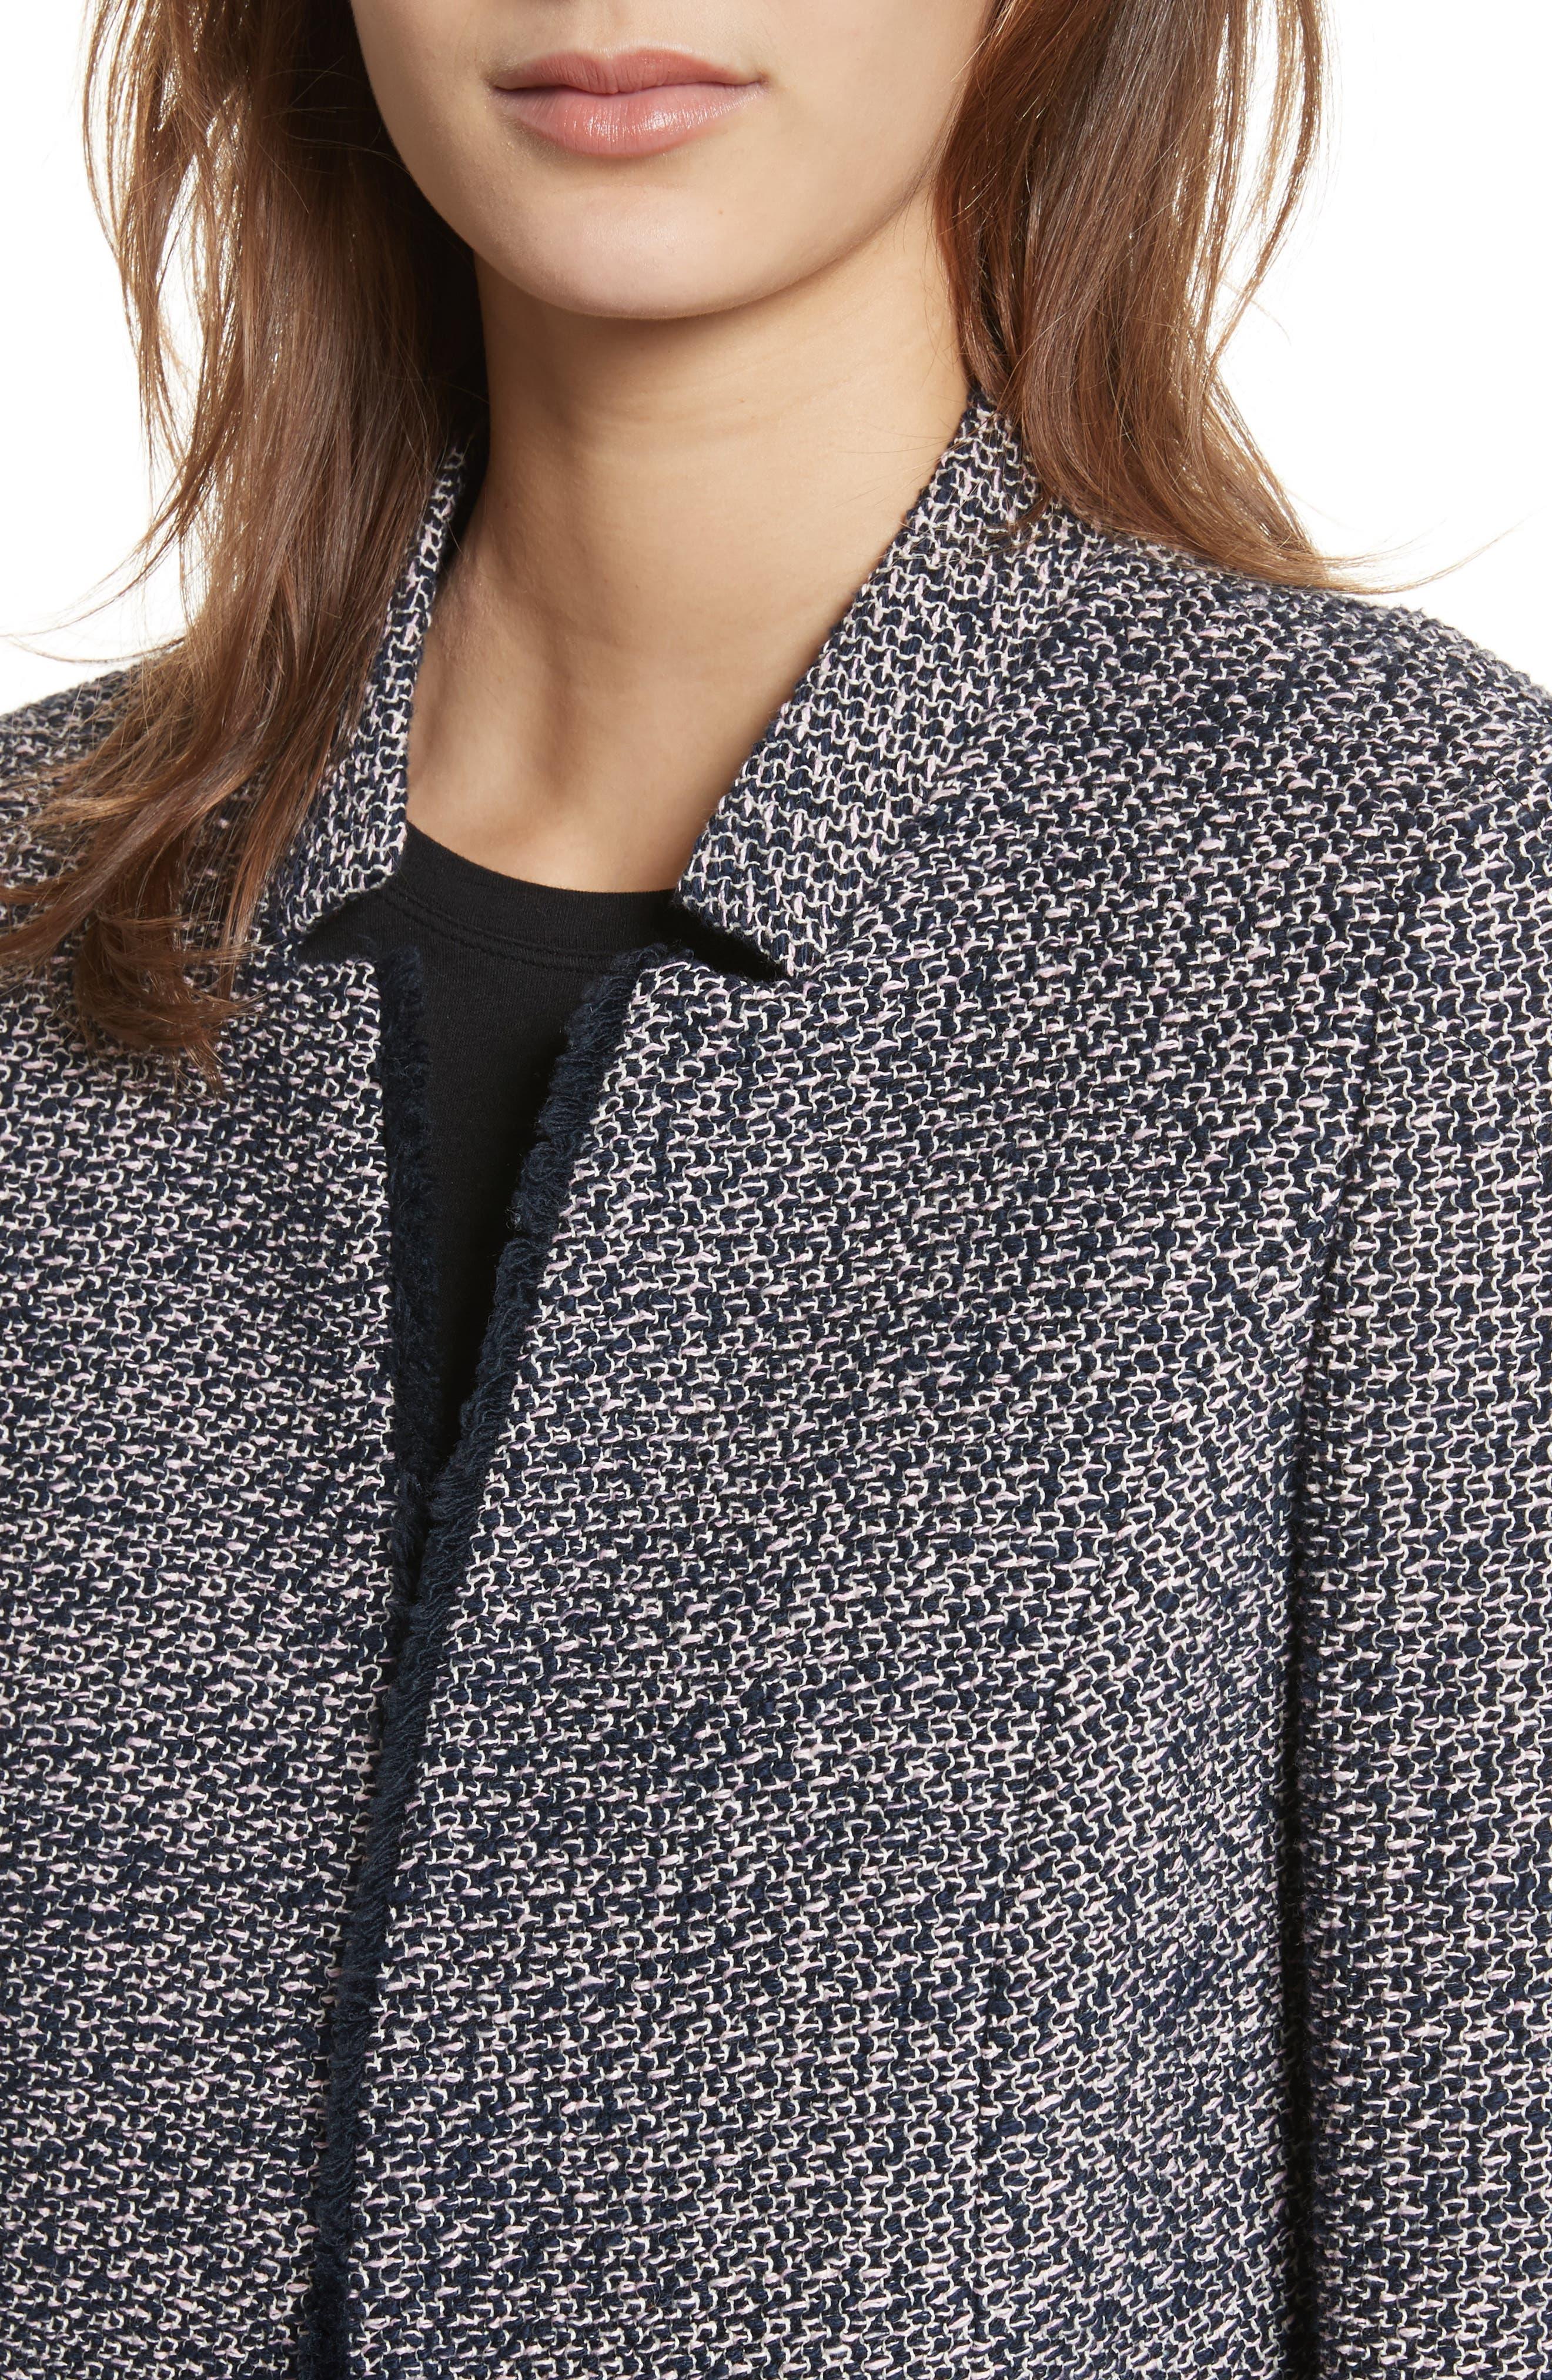 Notch Collar Tweed Jacket,                             Alternate thumbnail 4, color,                             Navy/ Pink